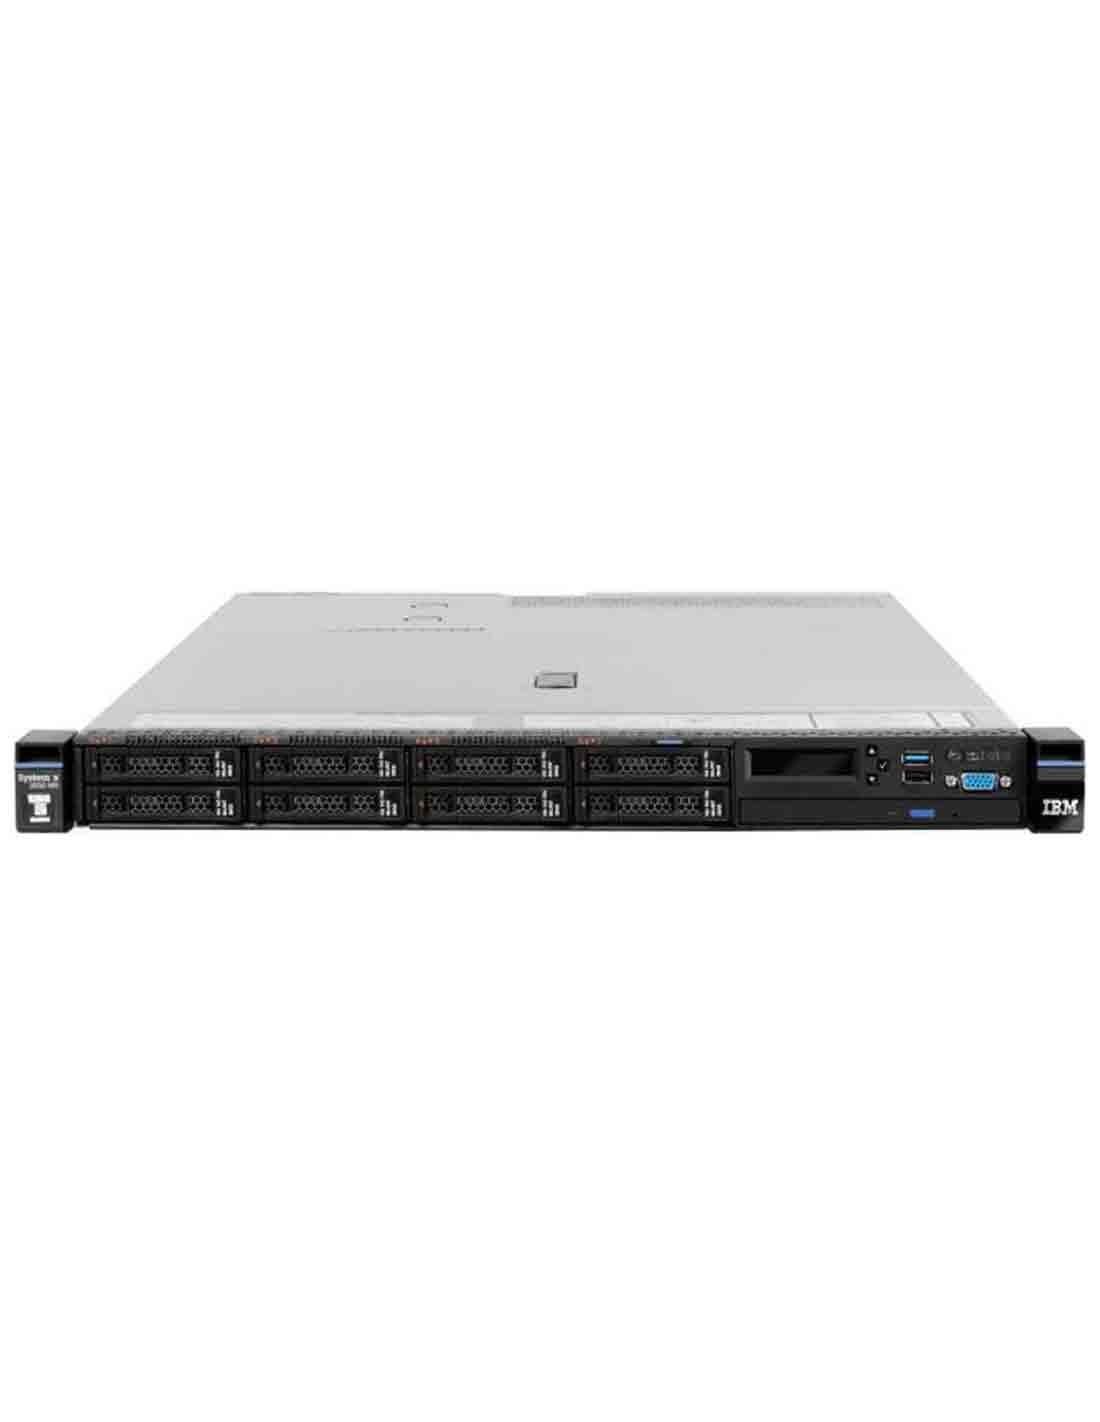 Lenovo x3550 M5 Rack Server E5-2640 v4 8869EHG Cheap Price in Dubai UAE